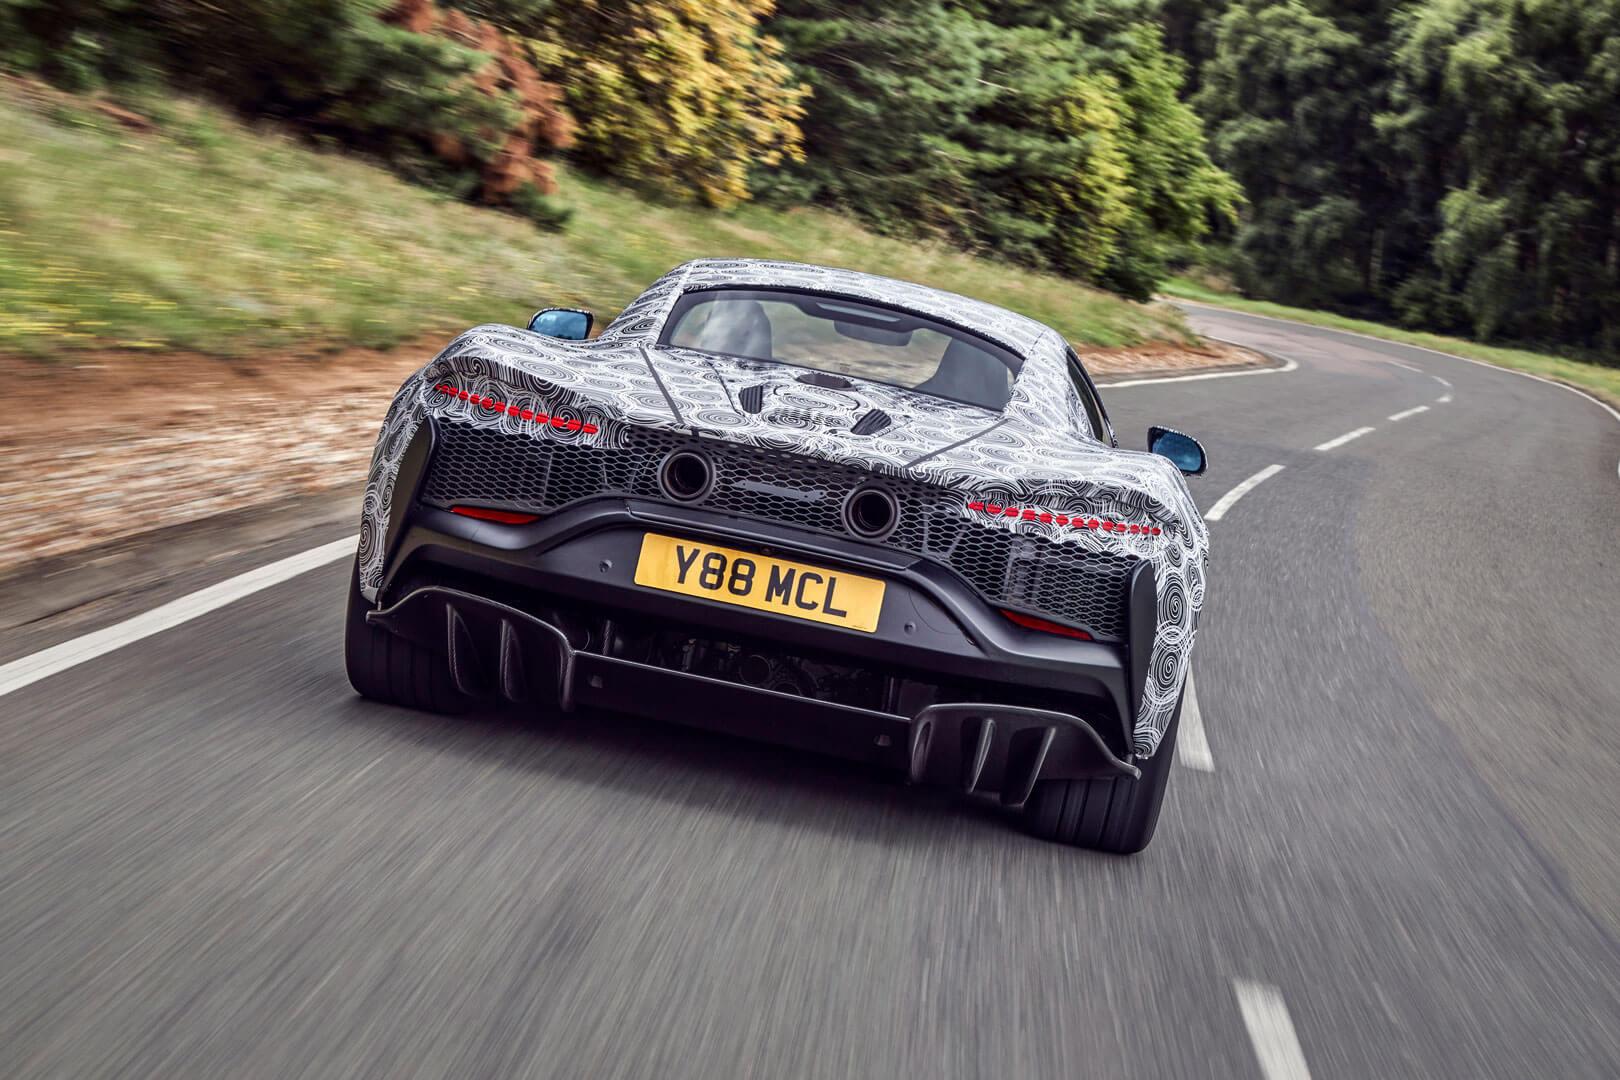 McLaren hybride super sportive